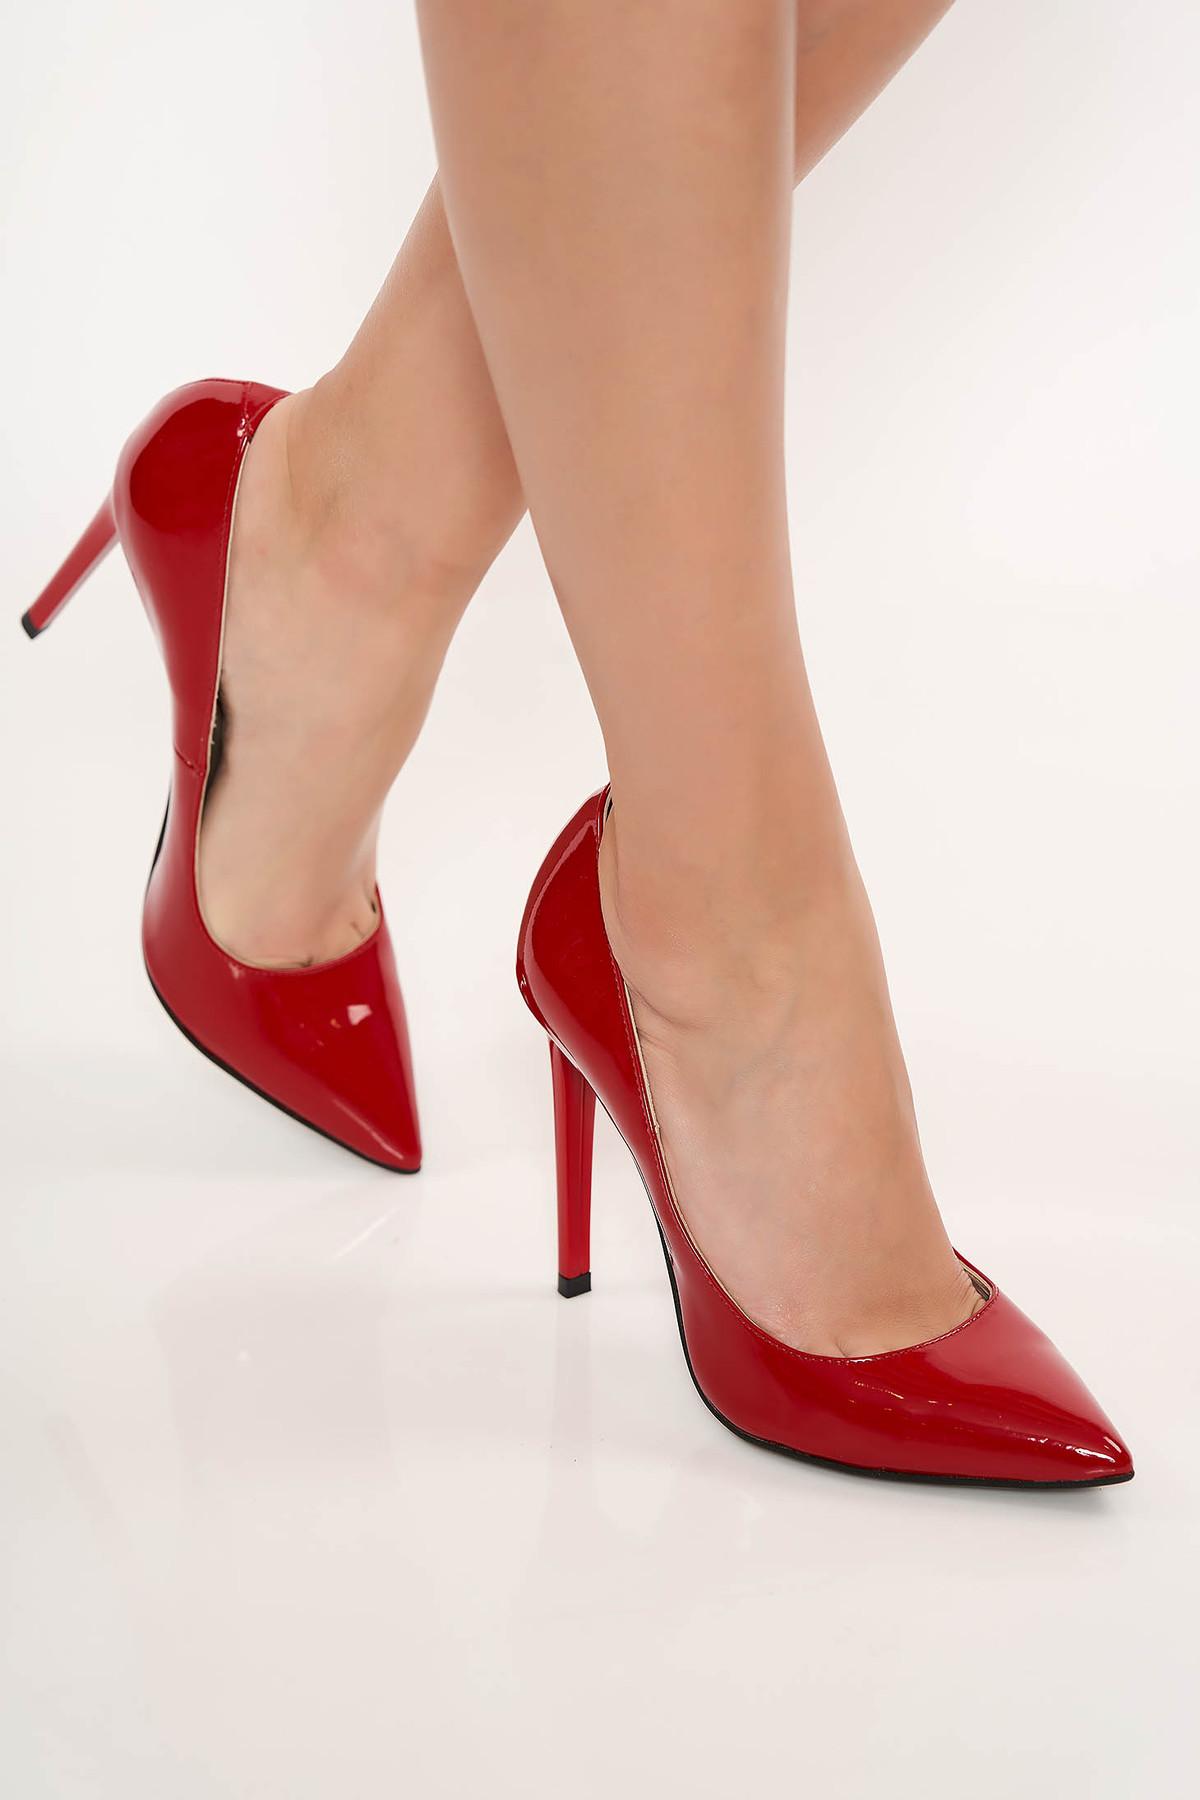 Pantofi rosu stiletto elegant din piele naturala cu toc inalt